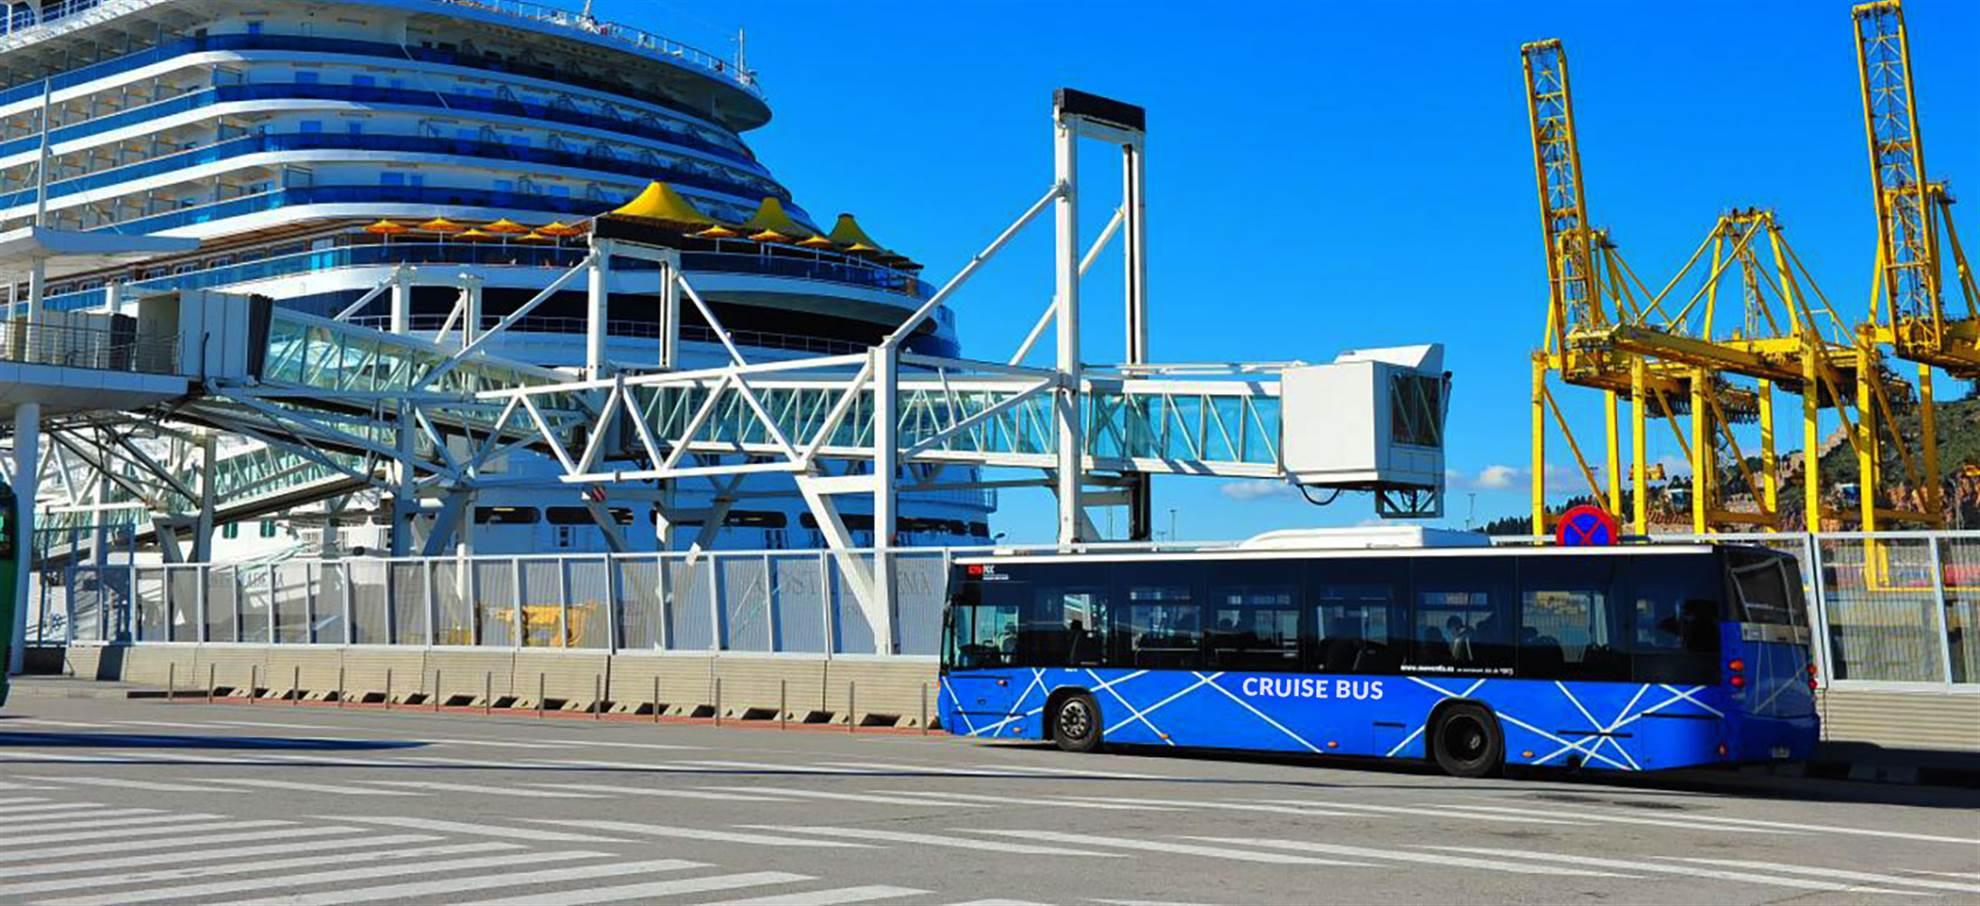 Bus Transfer from Port of Barcelona to La Rambla